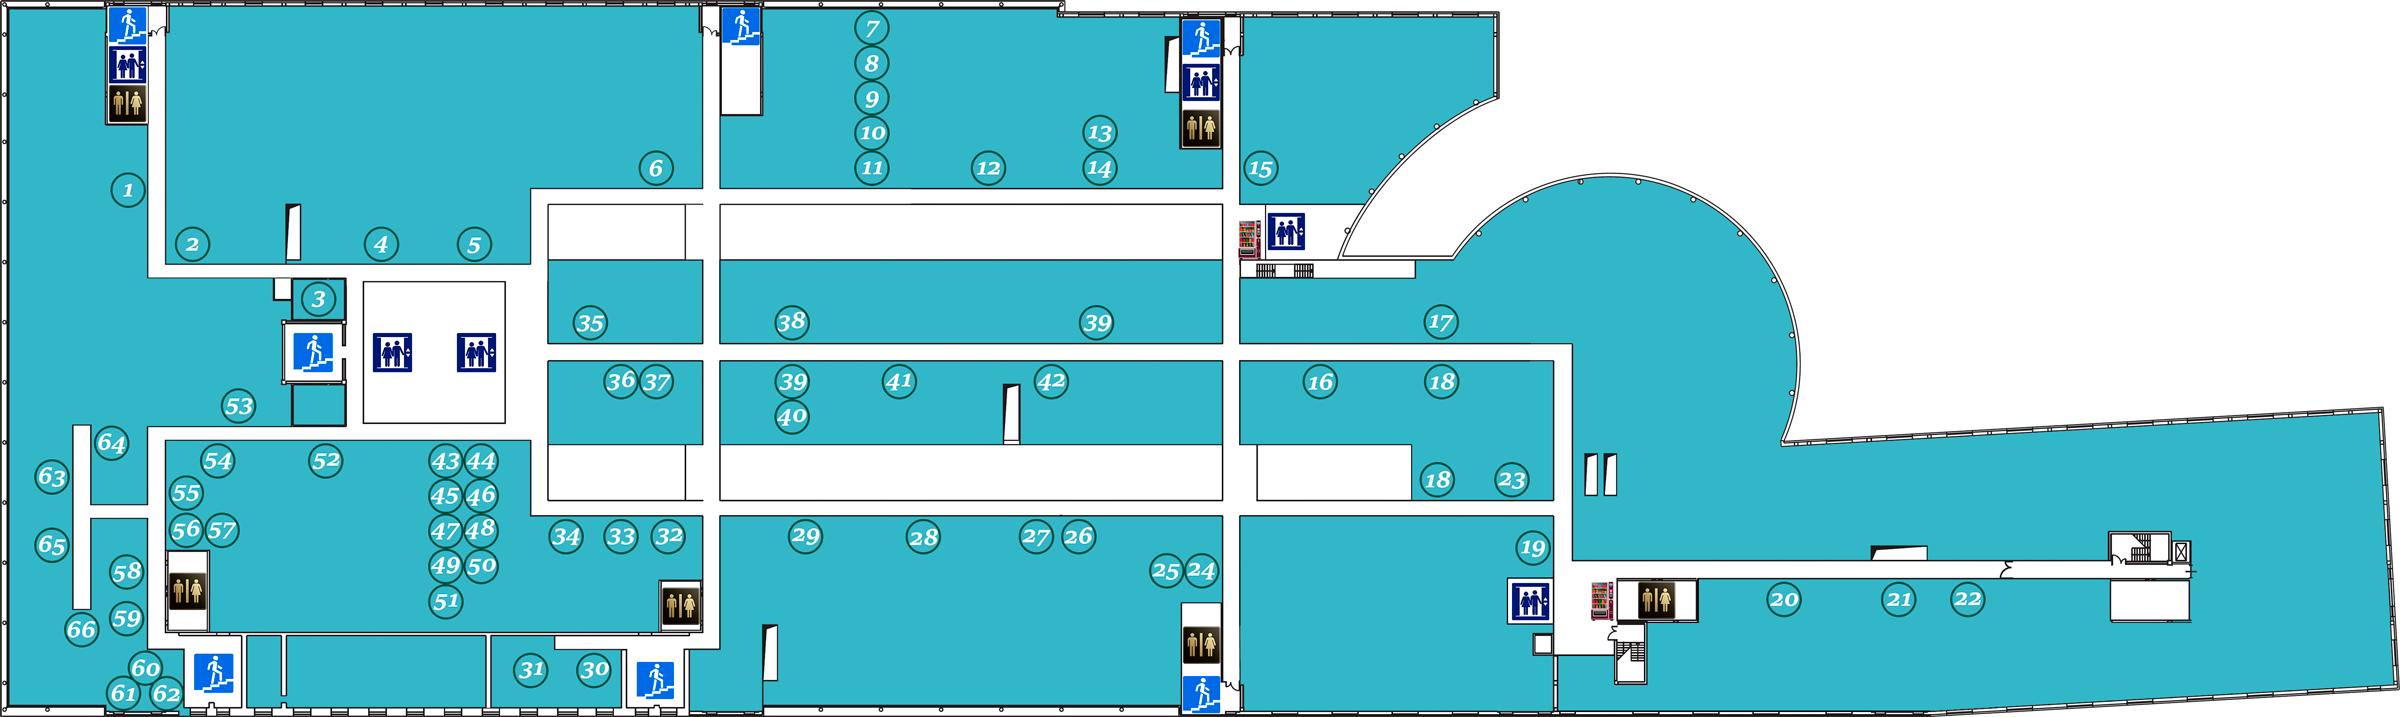 План арендаторов 4-го этада Б.Ц. Омега Плаза